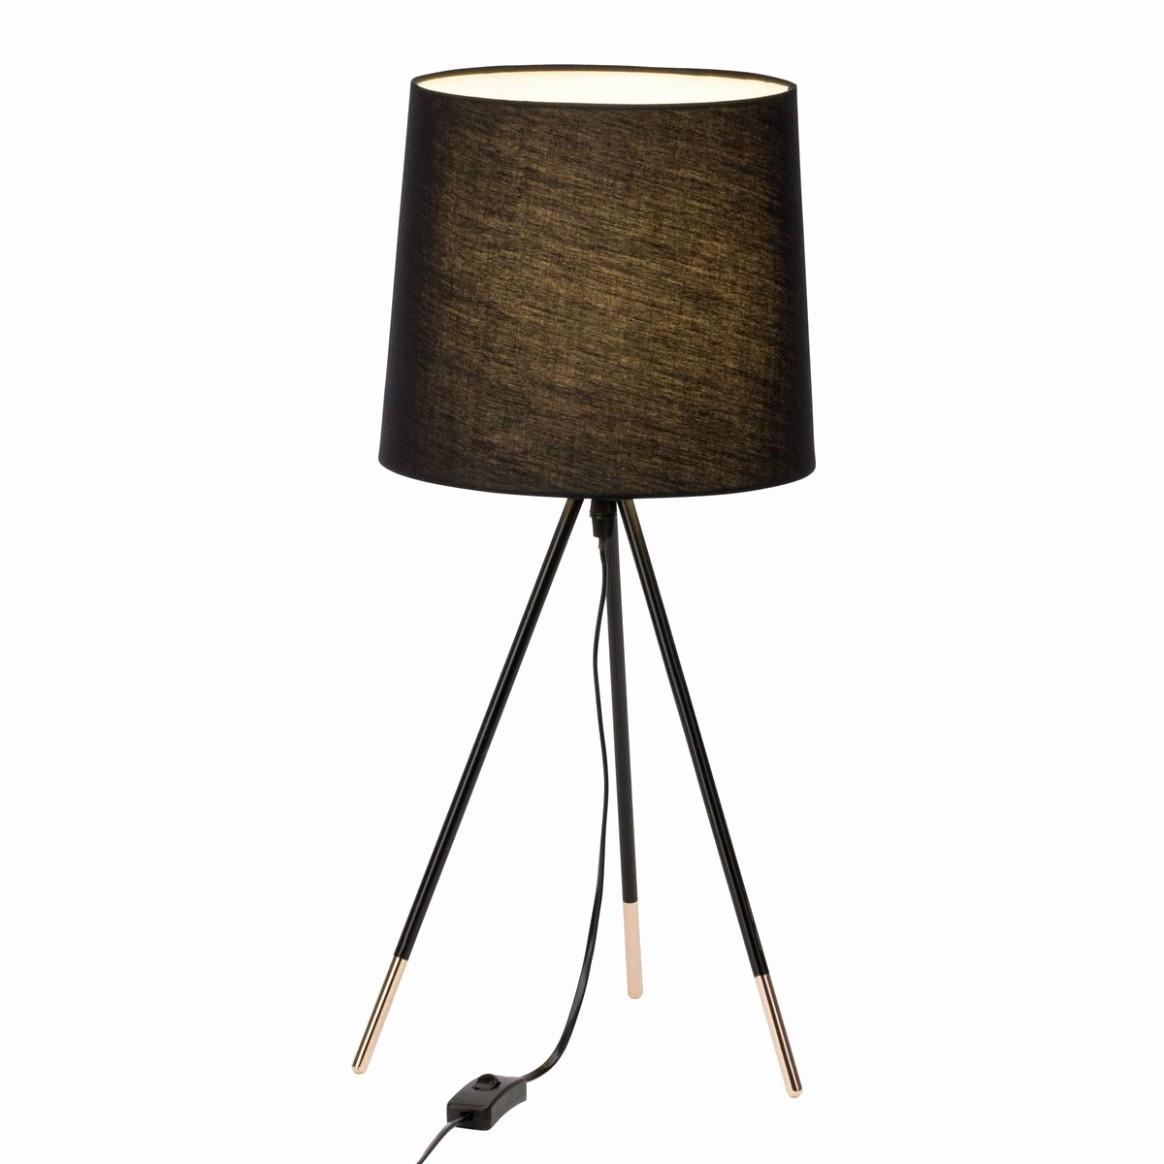 Grosse lampe a poser design